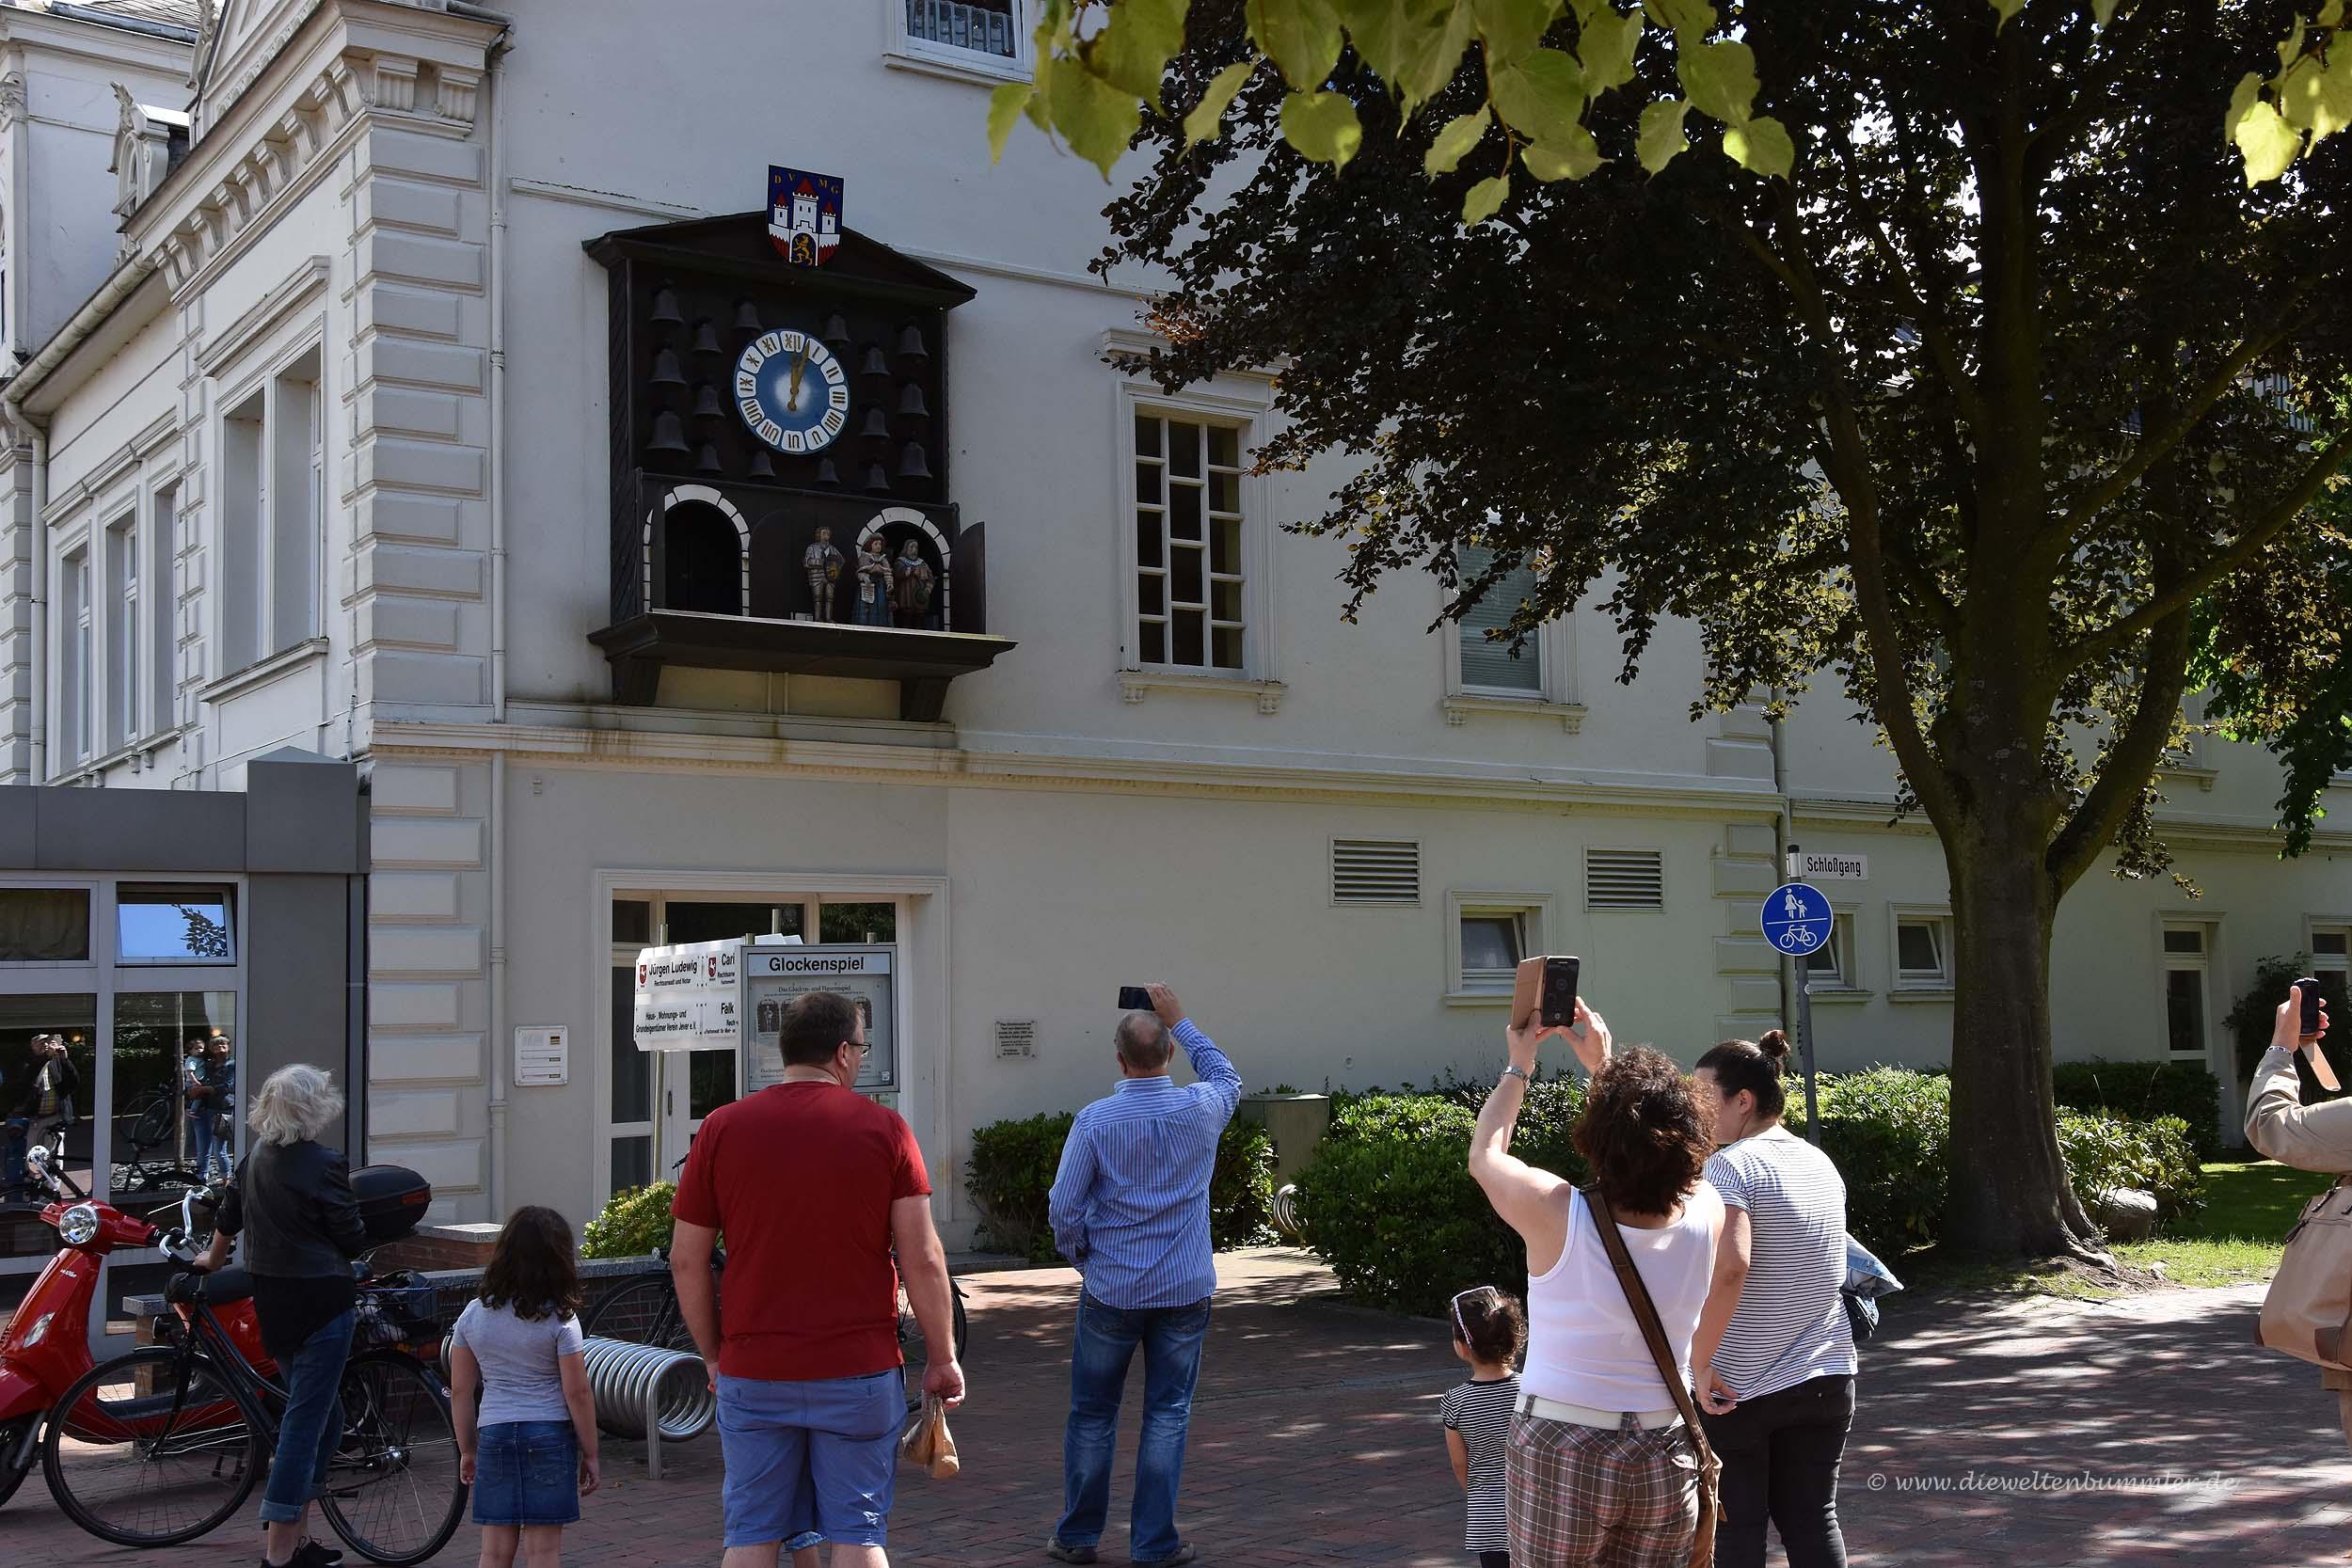 Glockenspiel in Jever